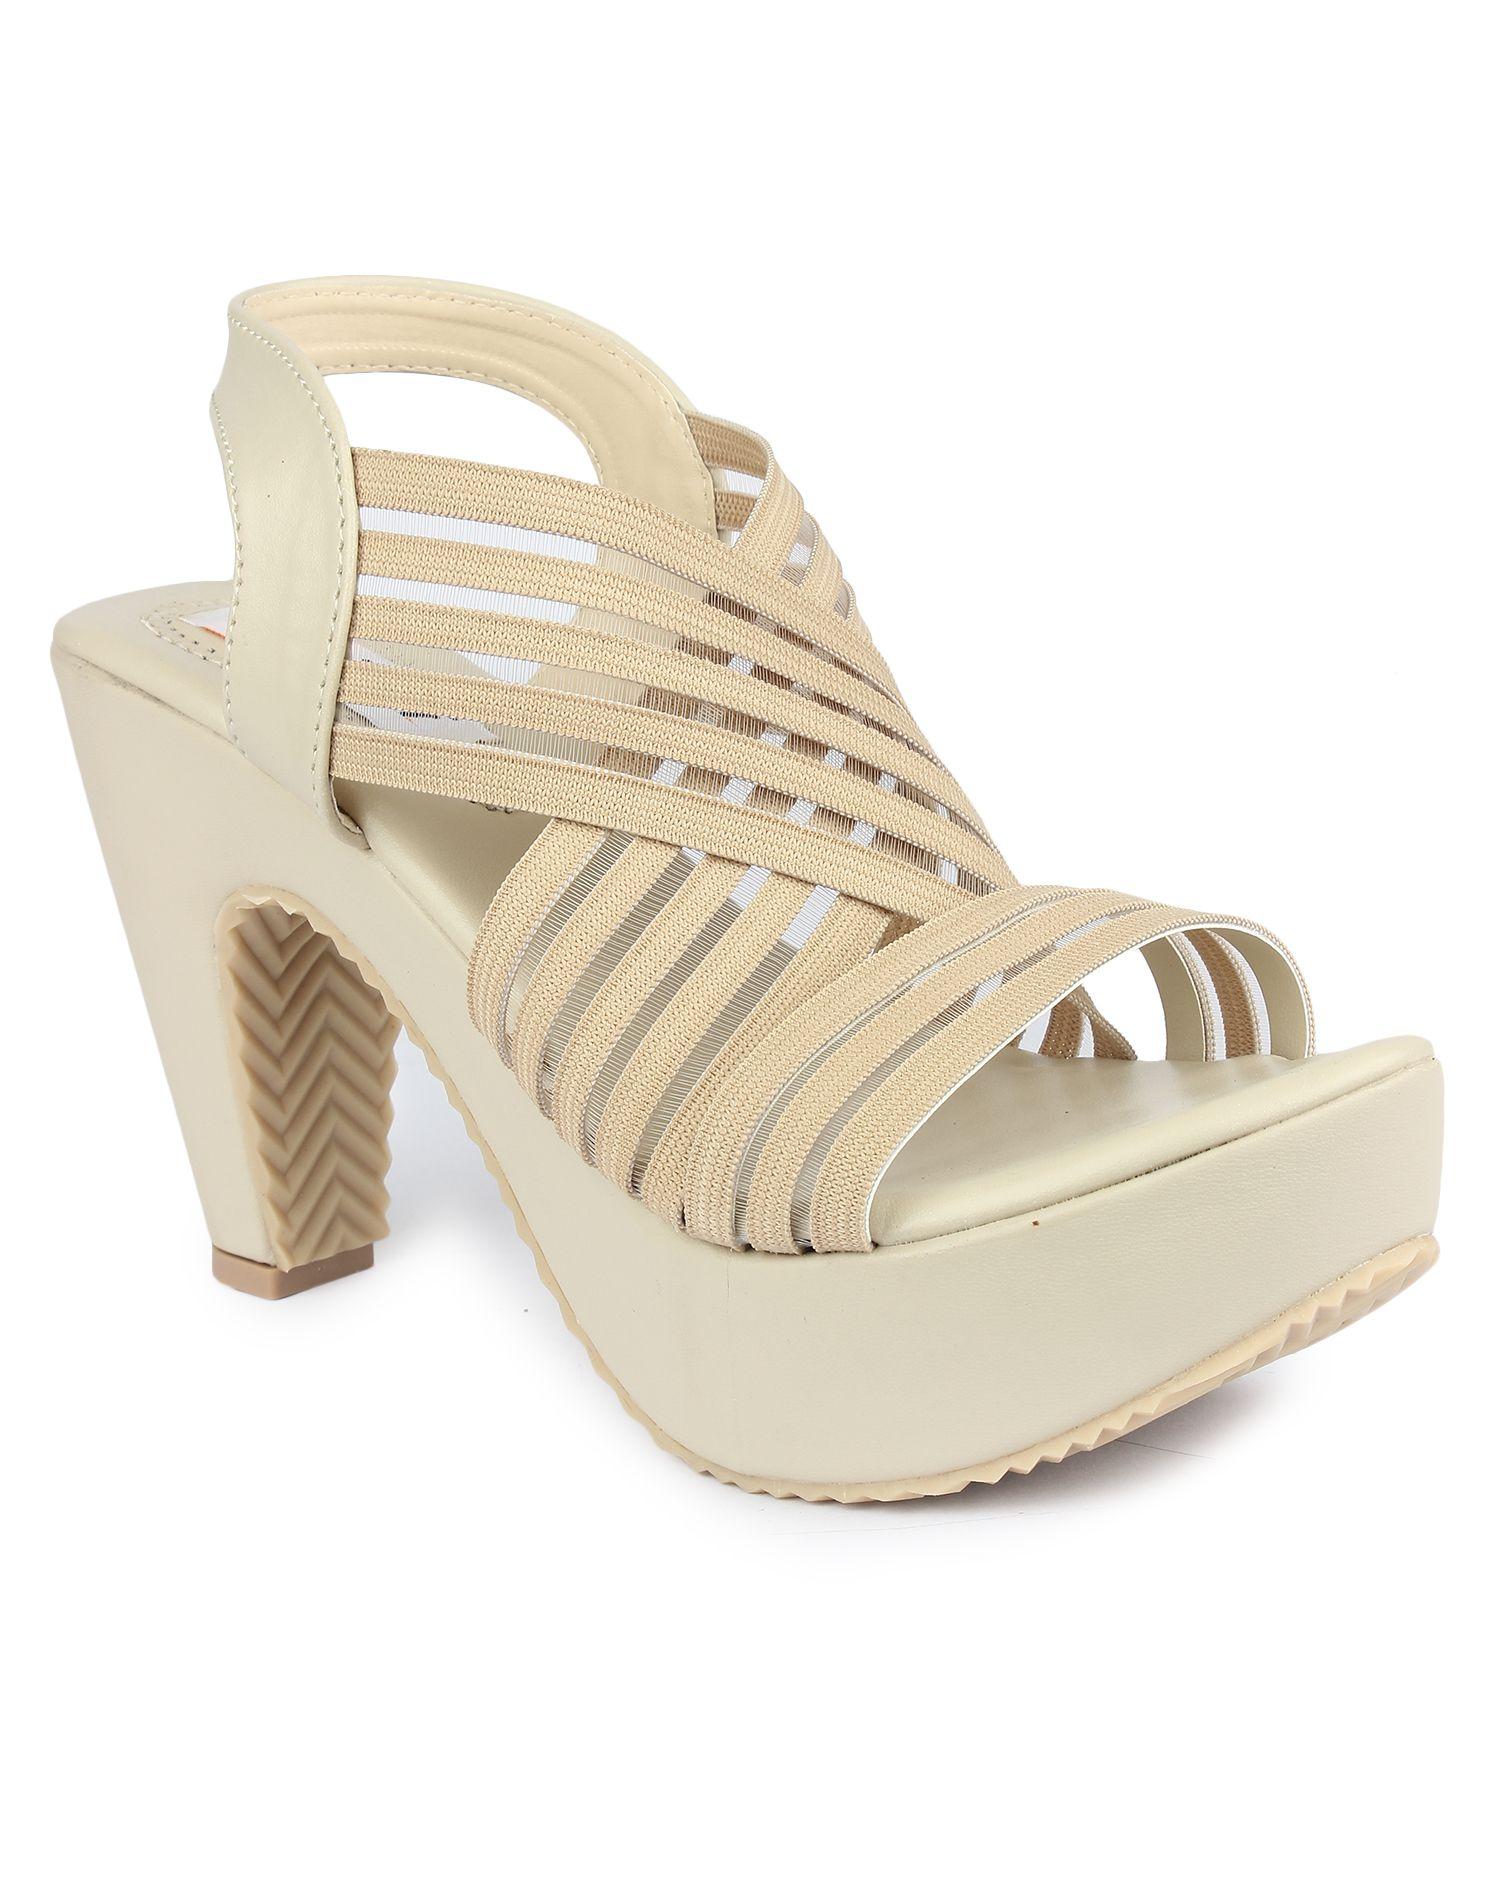 DIGNI Cream Cone Heels